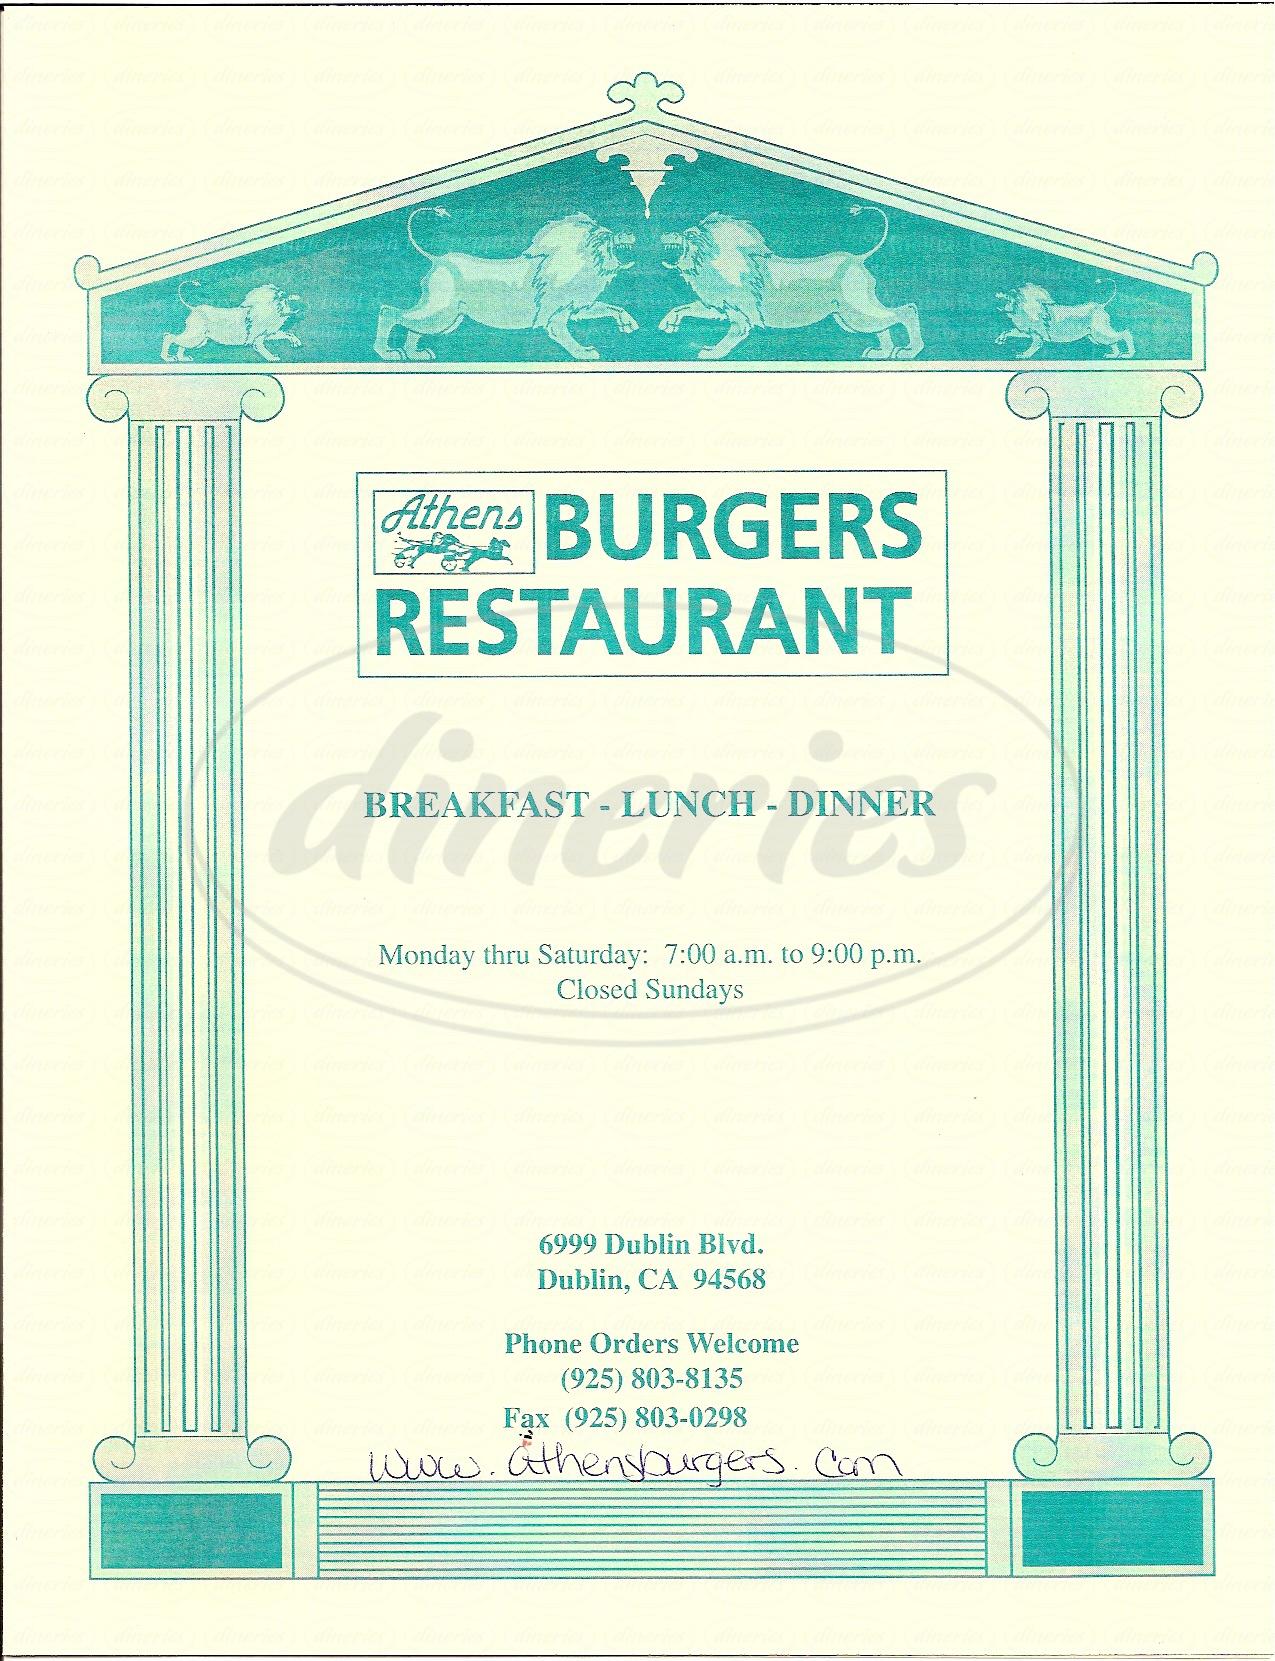 menu for Athens Burgers